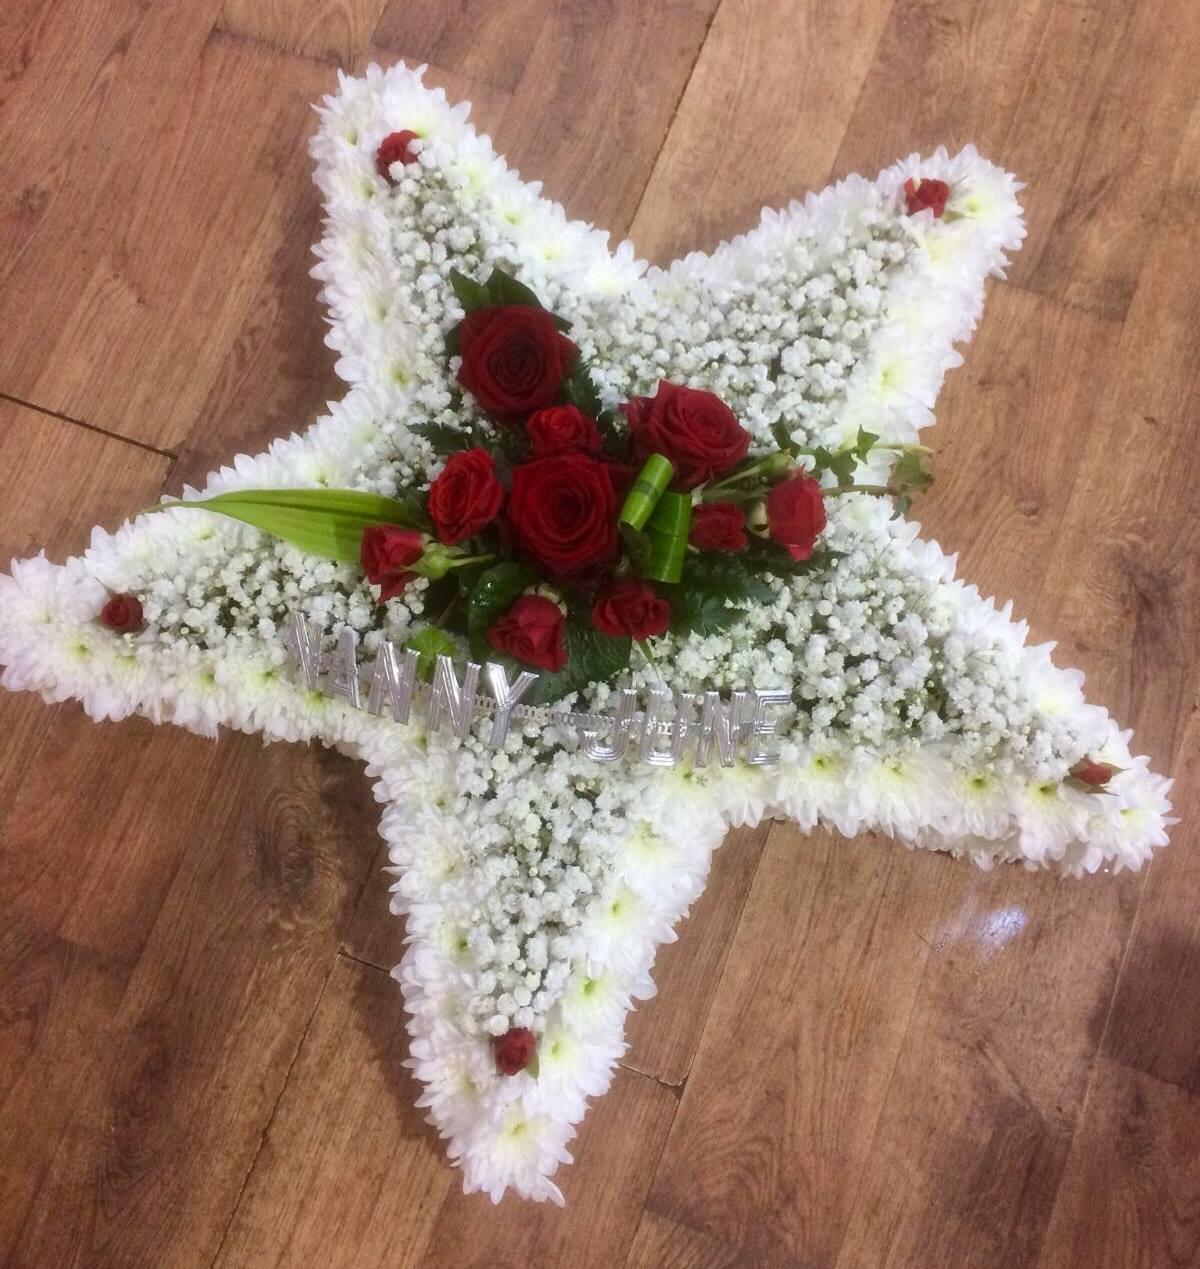 Gypsophila Star with Red Rose Spray